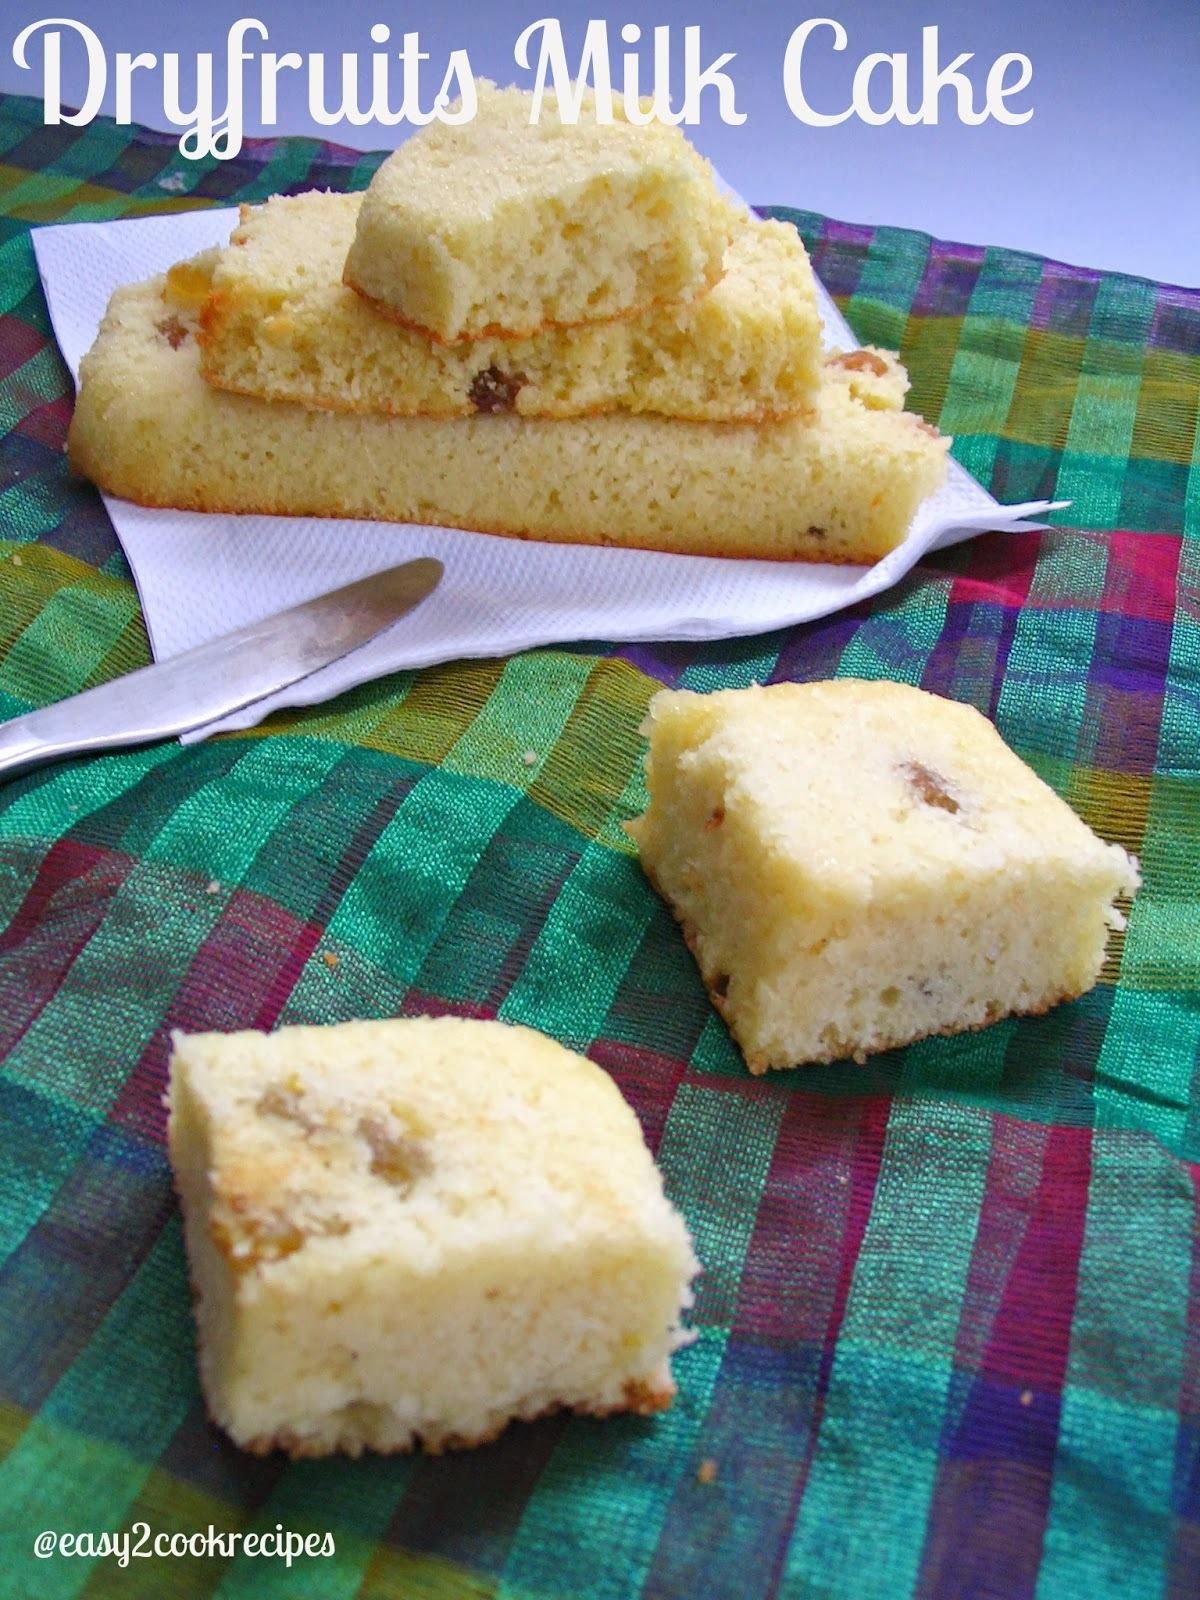 DRYFRUITS MILK CAKE